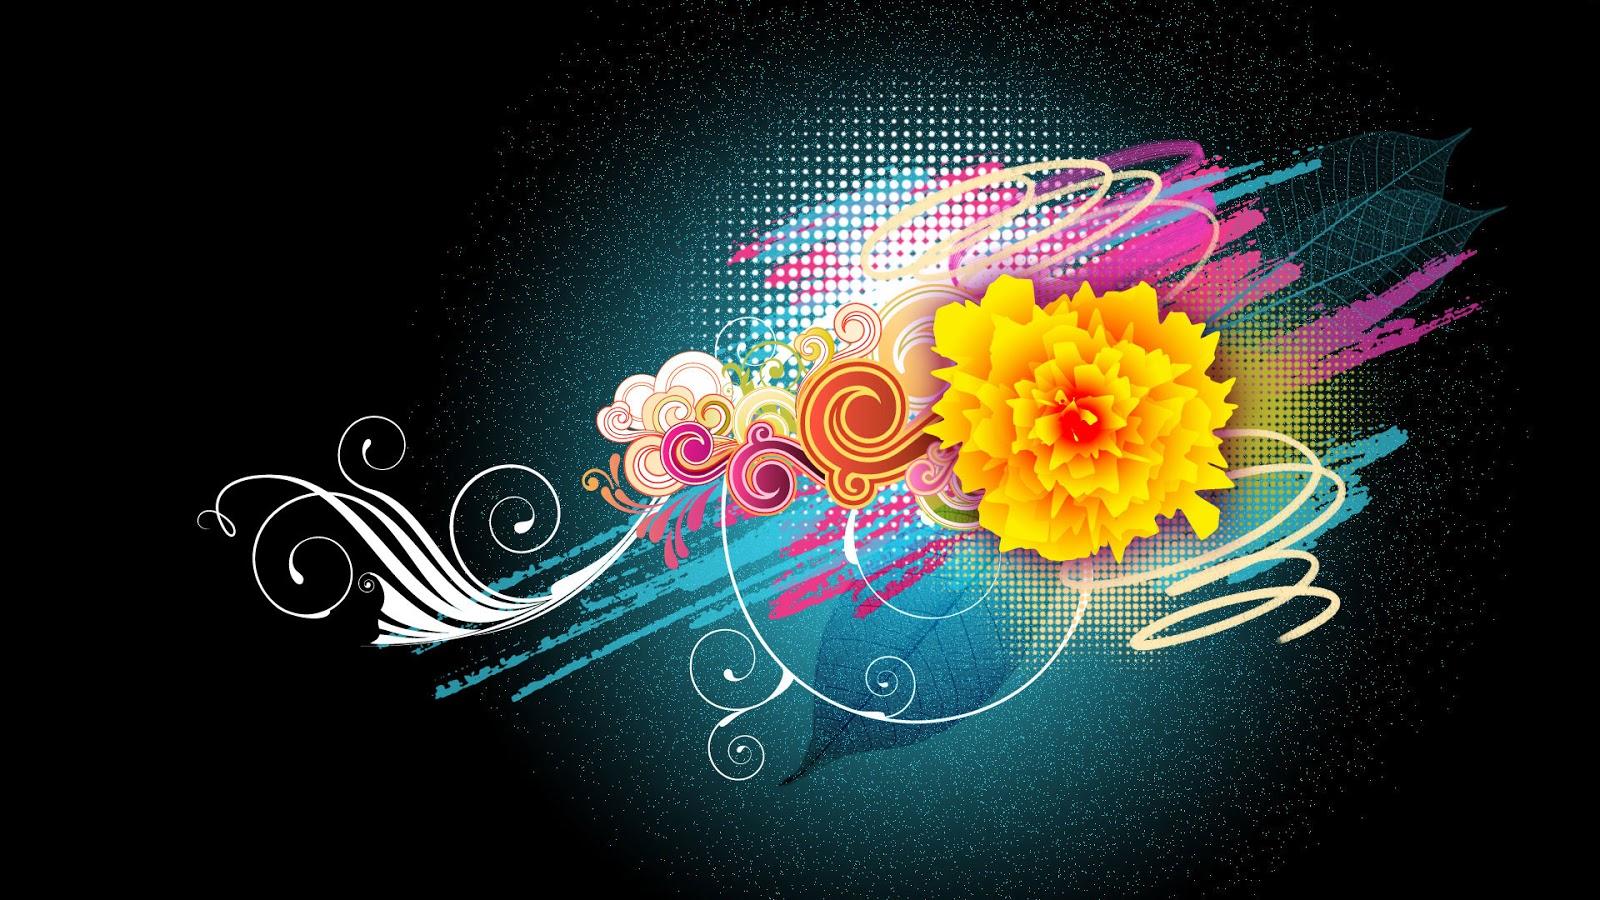 Hd Wallpaper Graphic: beautiful 2013 backgrounds design hd ...